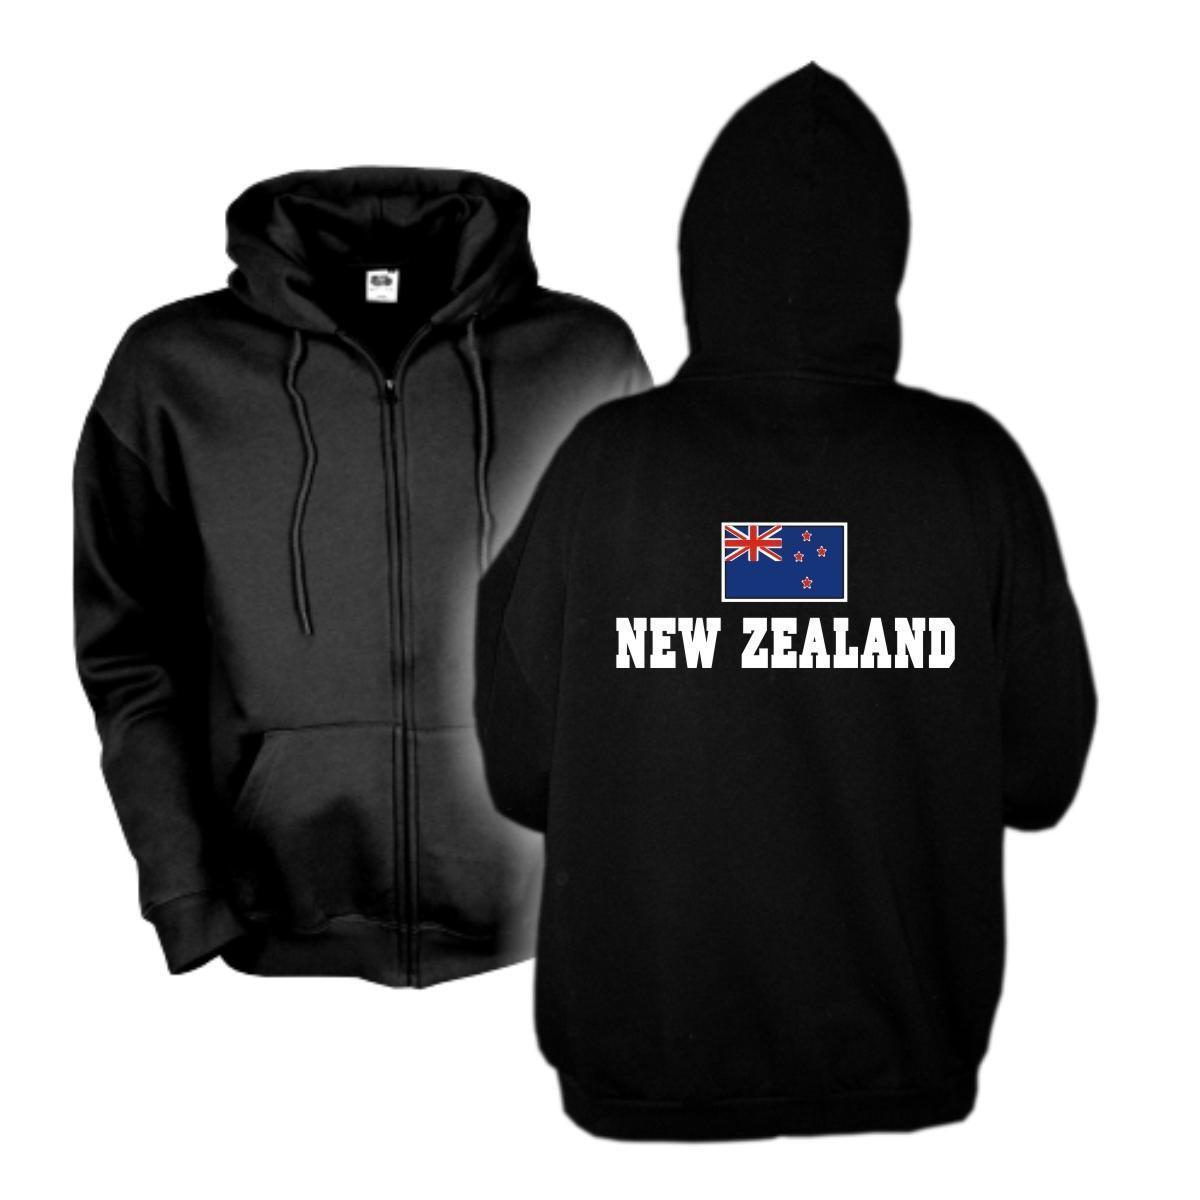 Kapuzenjacke NEUSEELAND New Zealand Flagshirt Hoodie Sweatjacke S-6XL WMS02-40e